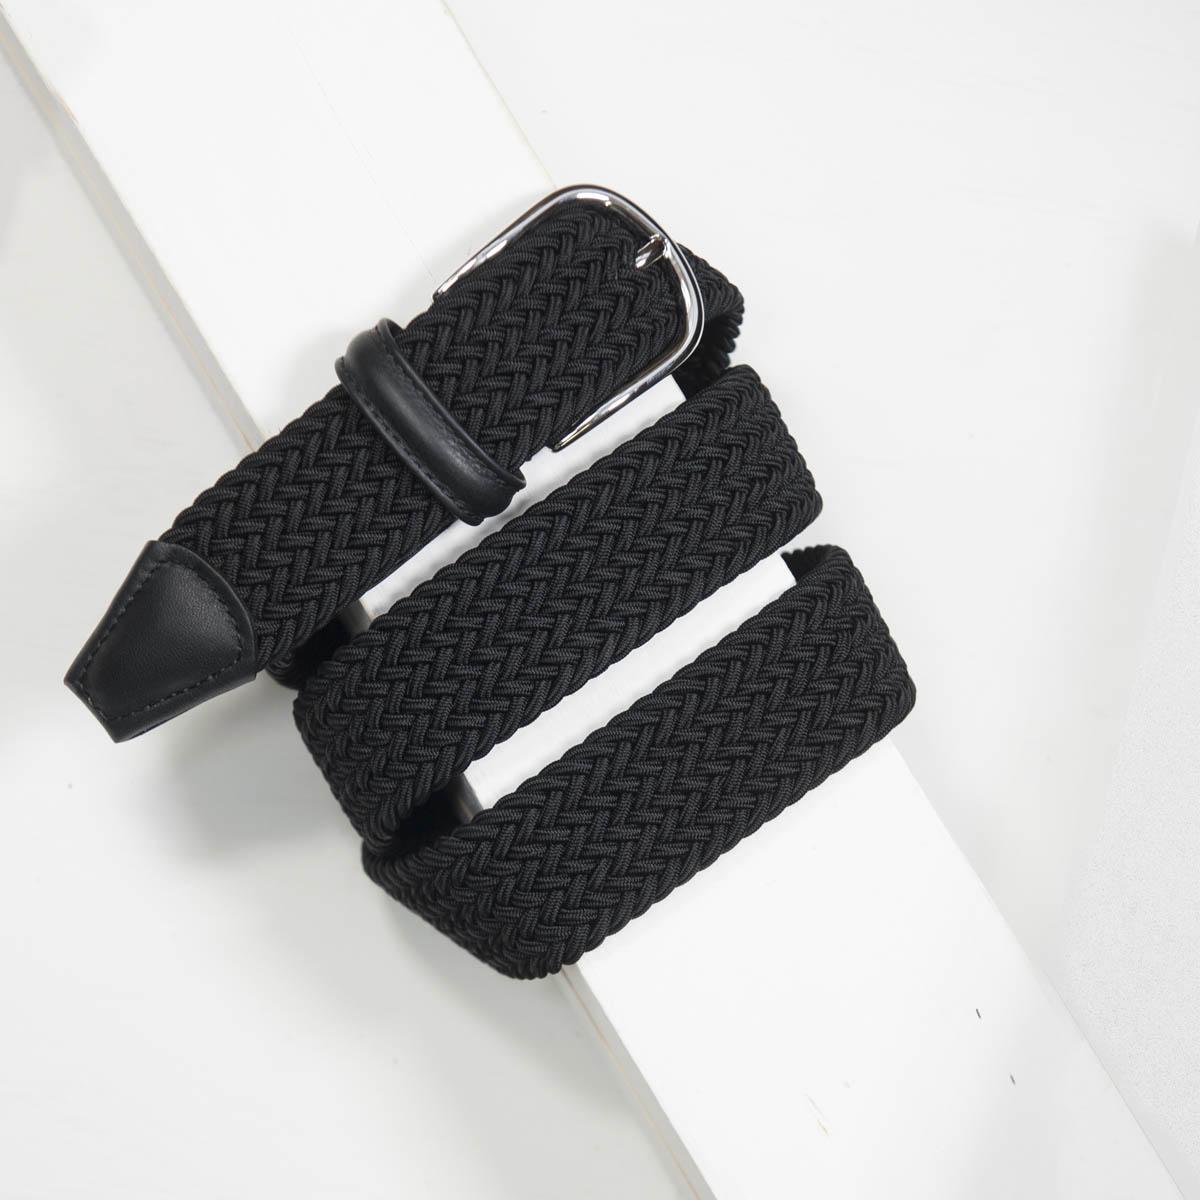 3,5 cm CLASSIC BLACK ELASTIC WOVEN BELT